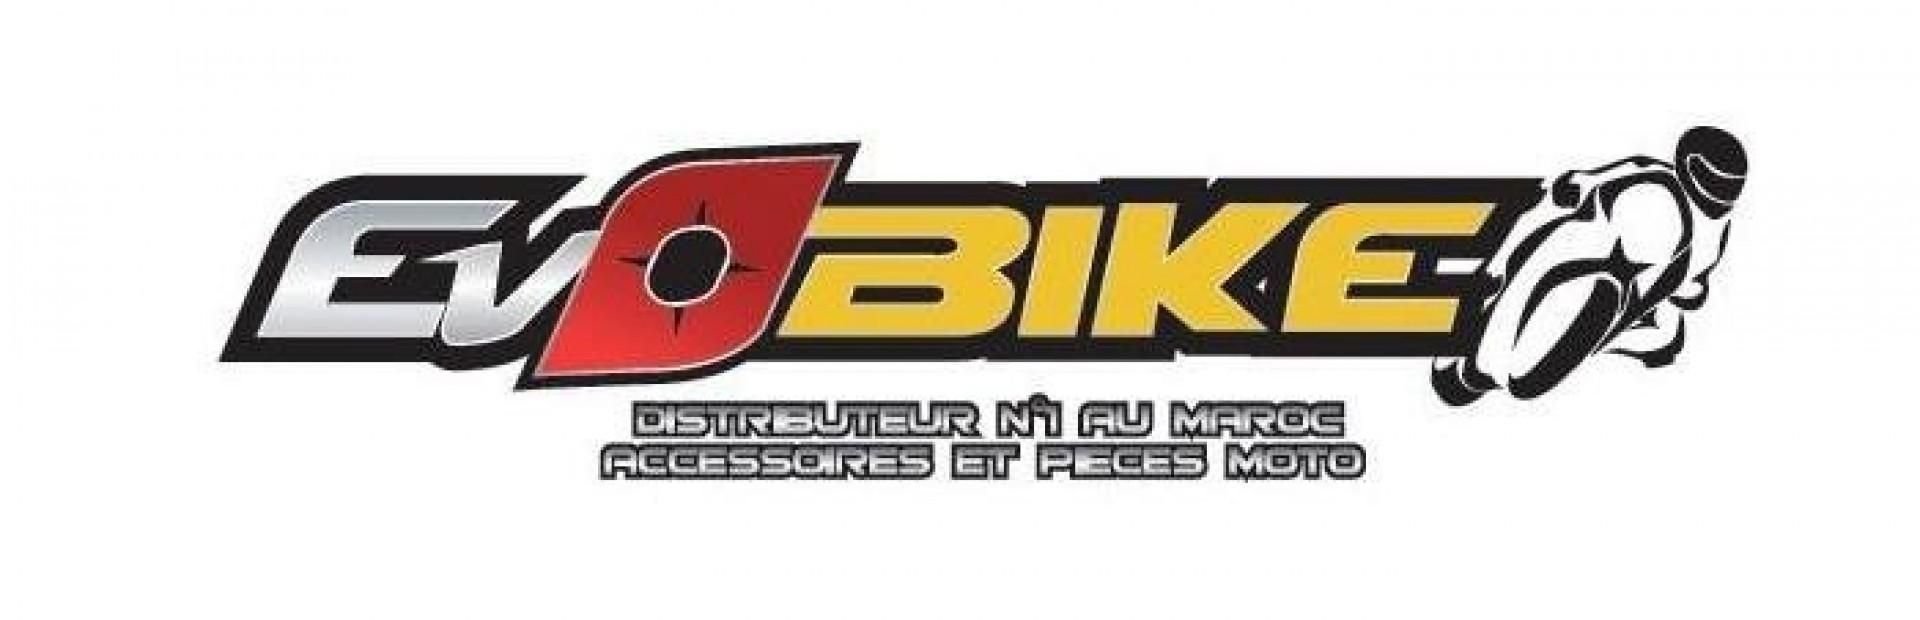 EVOBIKE  logo